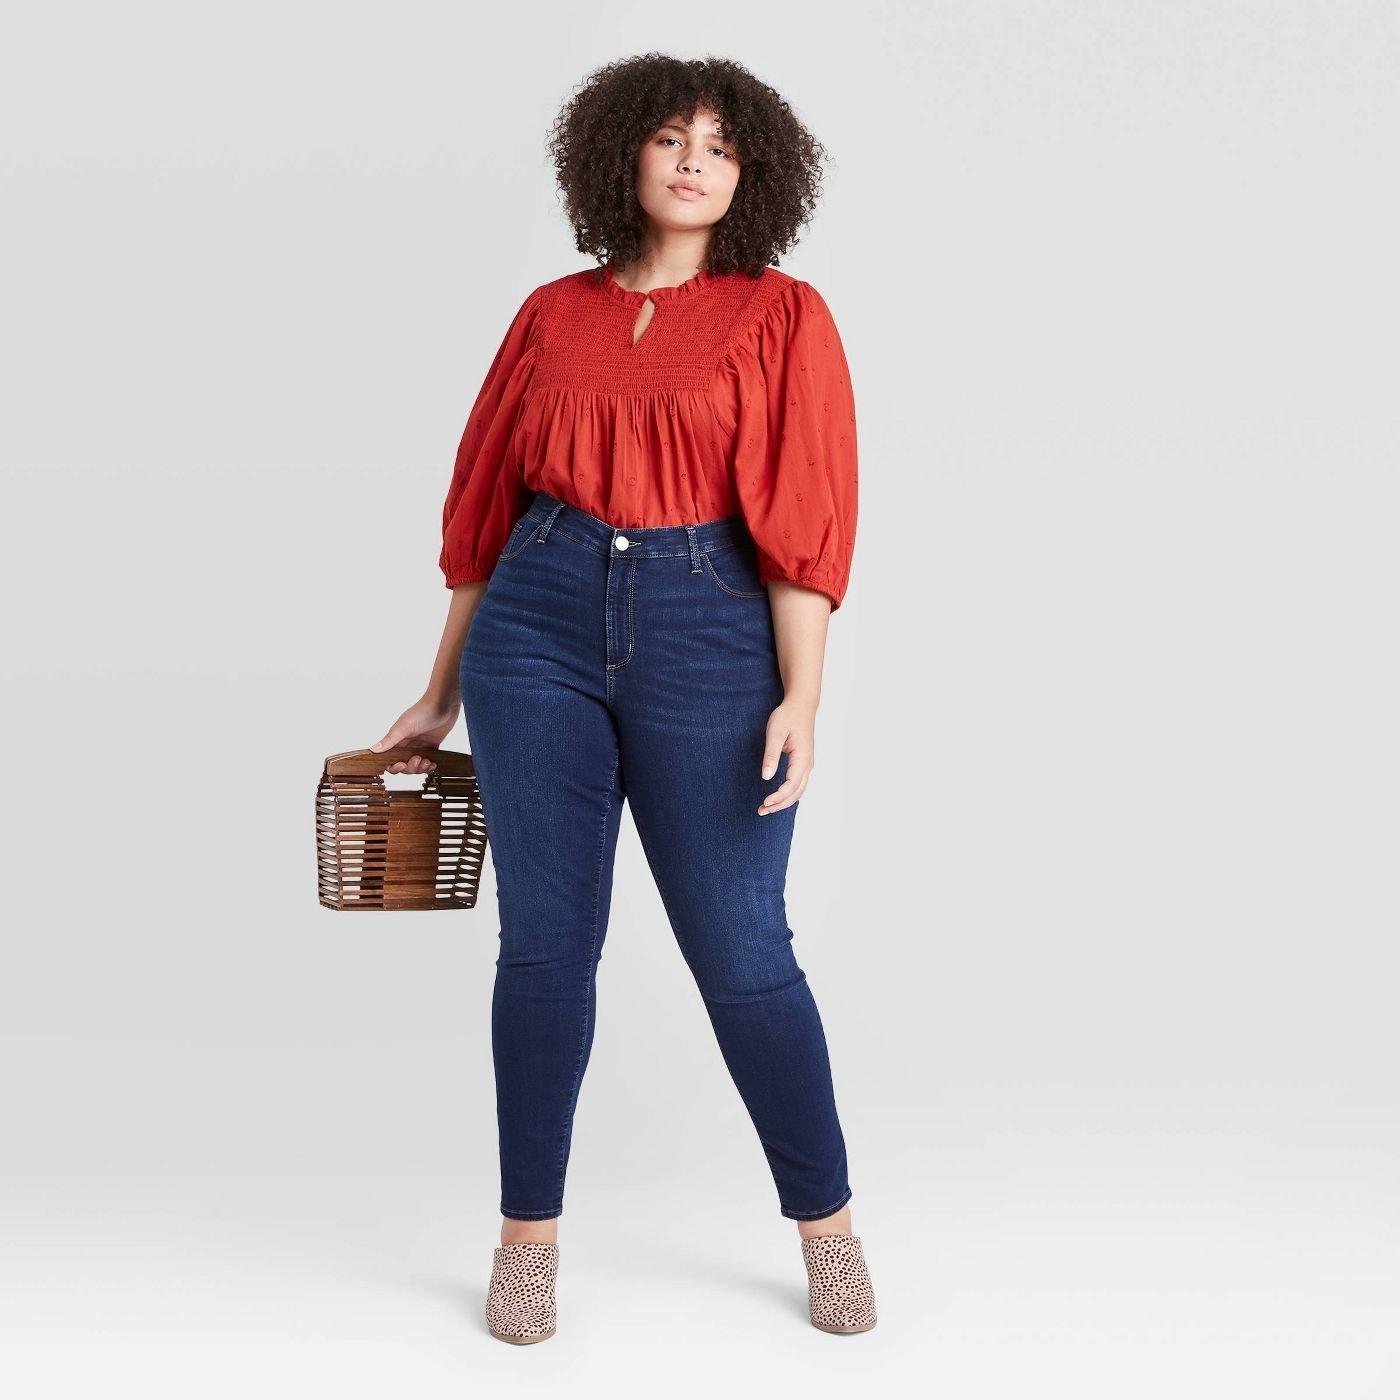 Model wearing dark skinny jeans